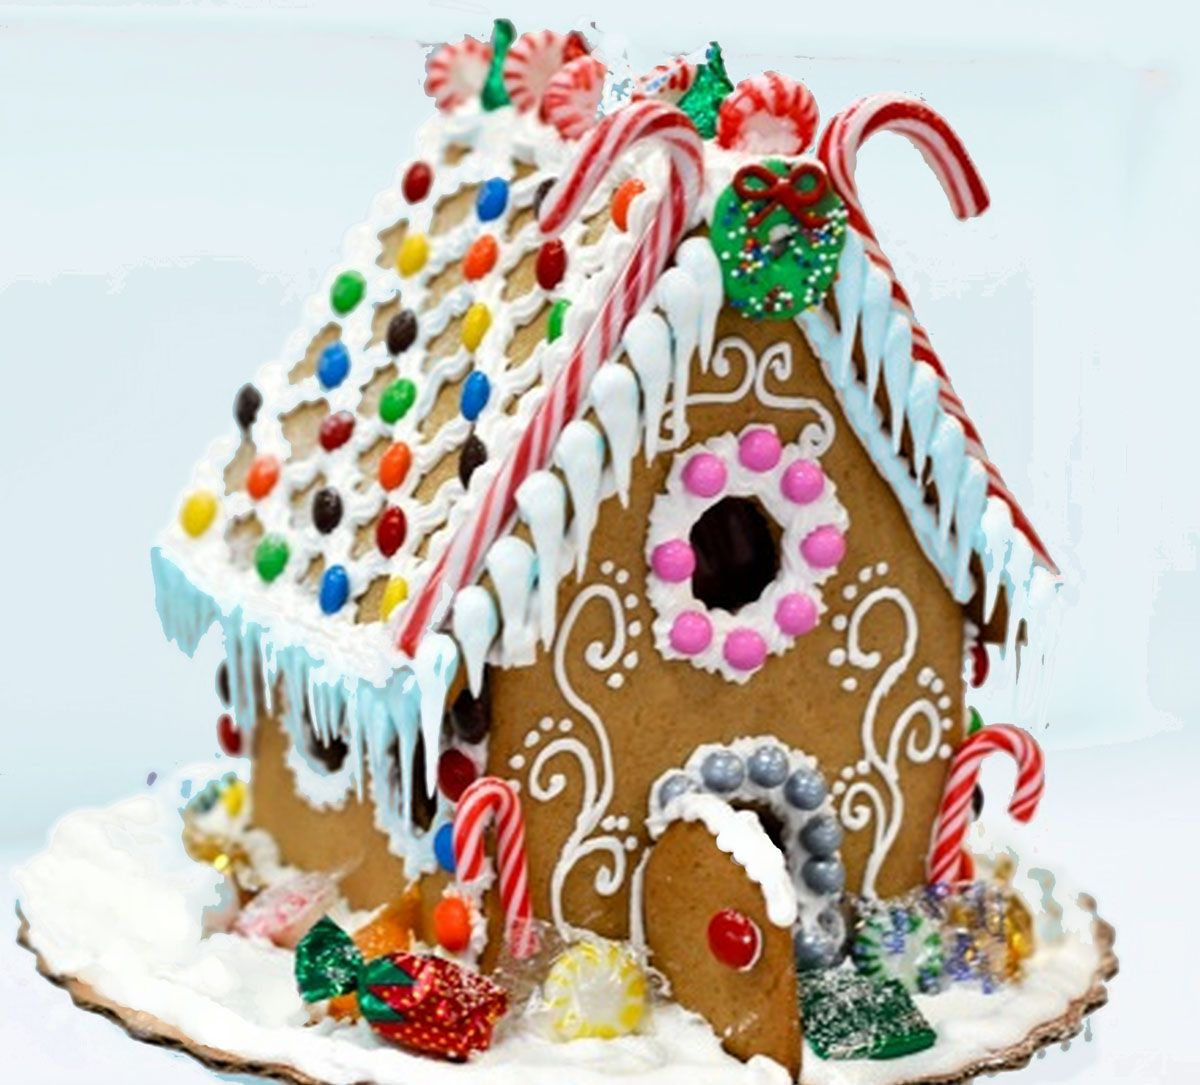 Beach Themed Gingerbread House: Gingerbread House Ideas